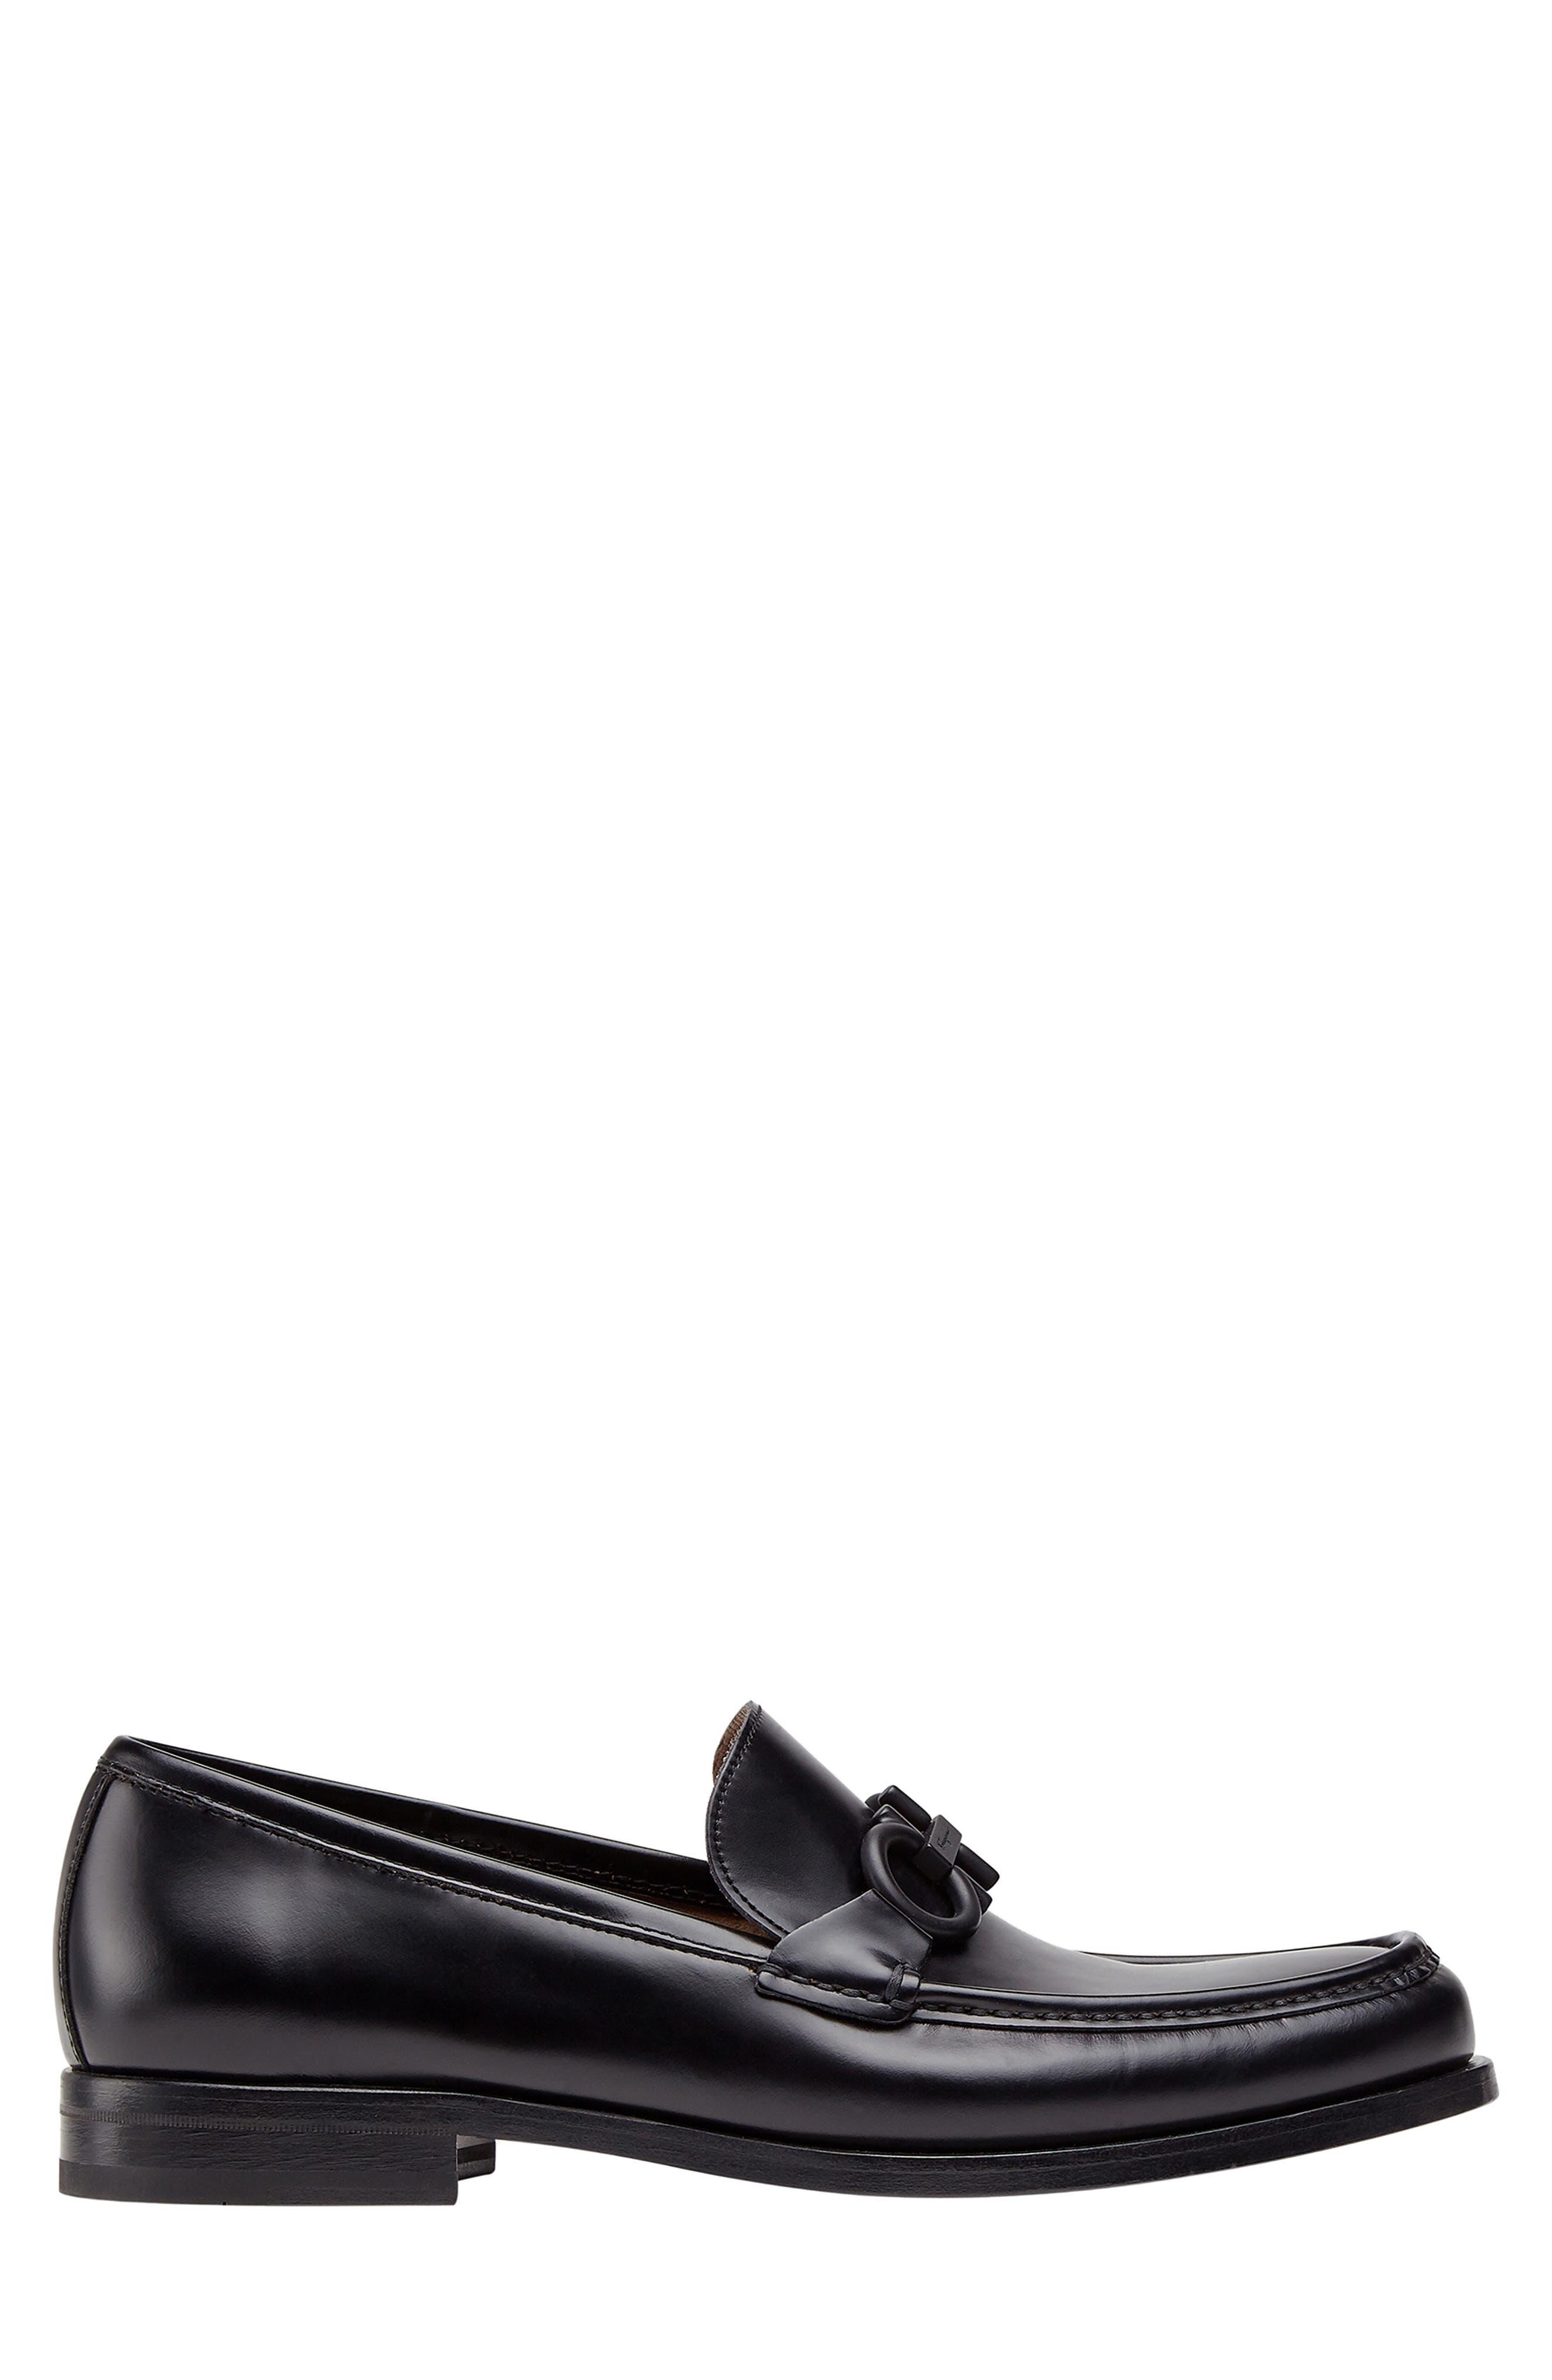 Salvatore Ferragamo Dress Shoes | Nordstrom